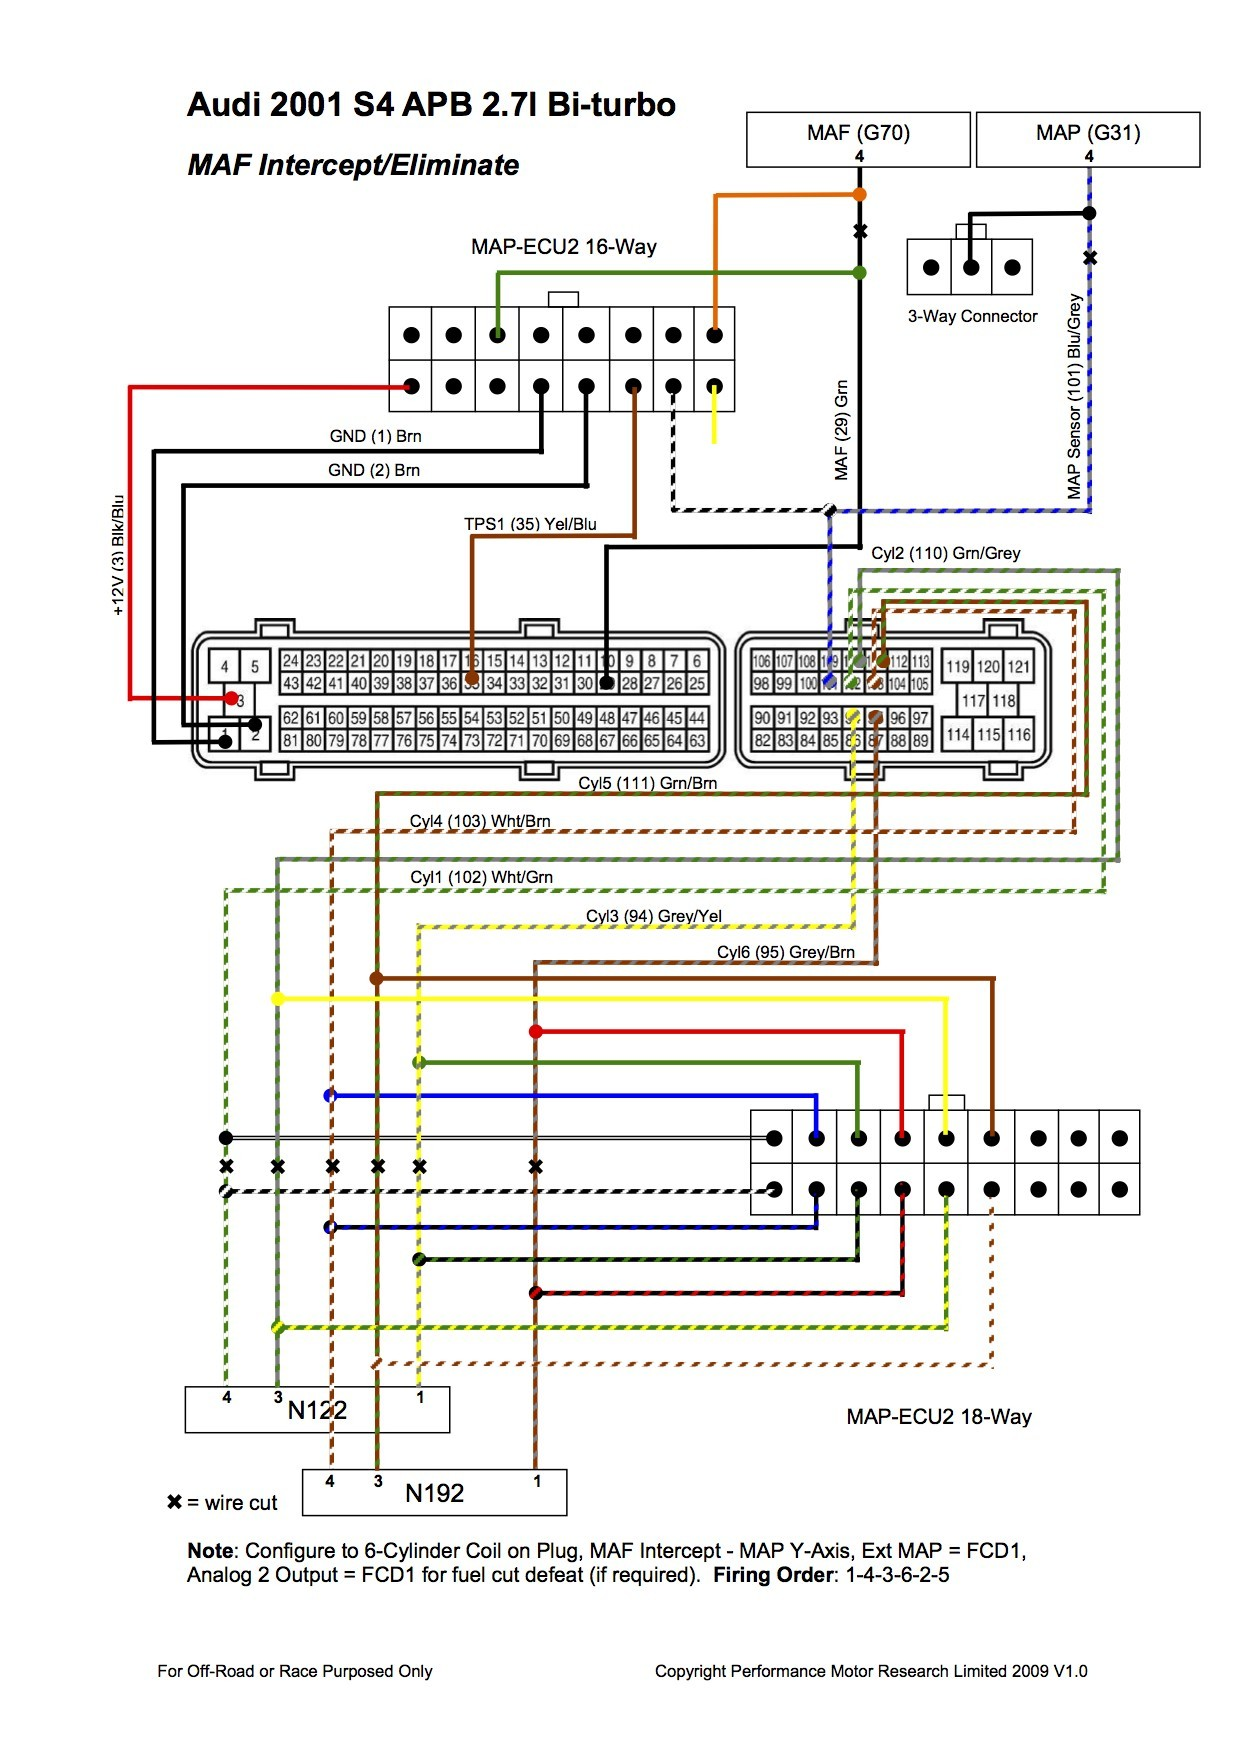 1995 dodge ram 1500 stereo wiring diagram wiring circuit u2022 rh wiringonline today 2011 dodge ram 1500 radio wiring diagram 2011 dodge ram 1500 headlight wiring diagram